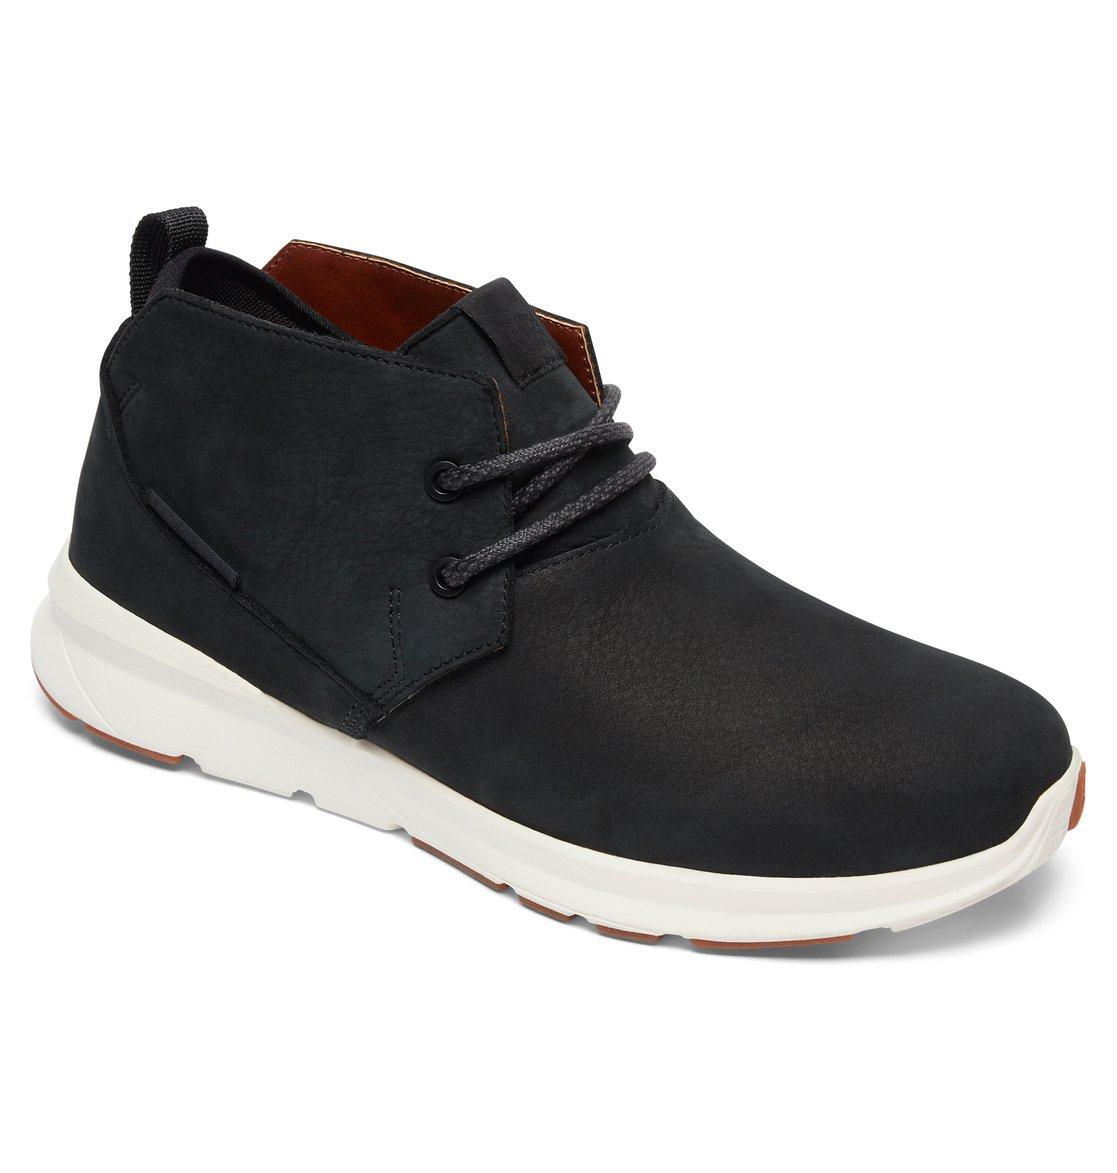 DC Shoes Ashlar - Mid-Top Shoes - Zapatillas De Media Bota - Hombre - EU 46